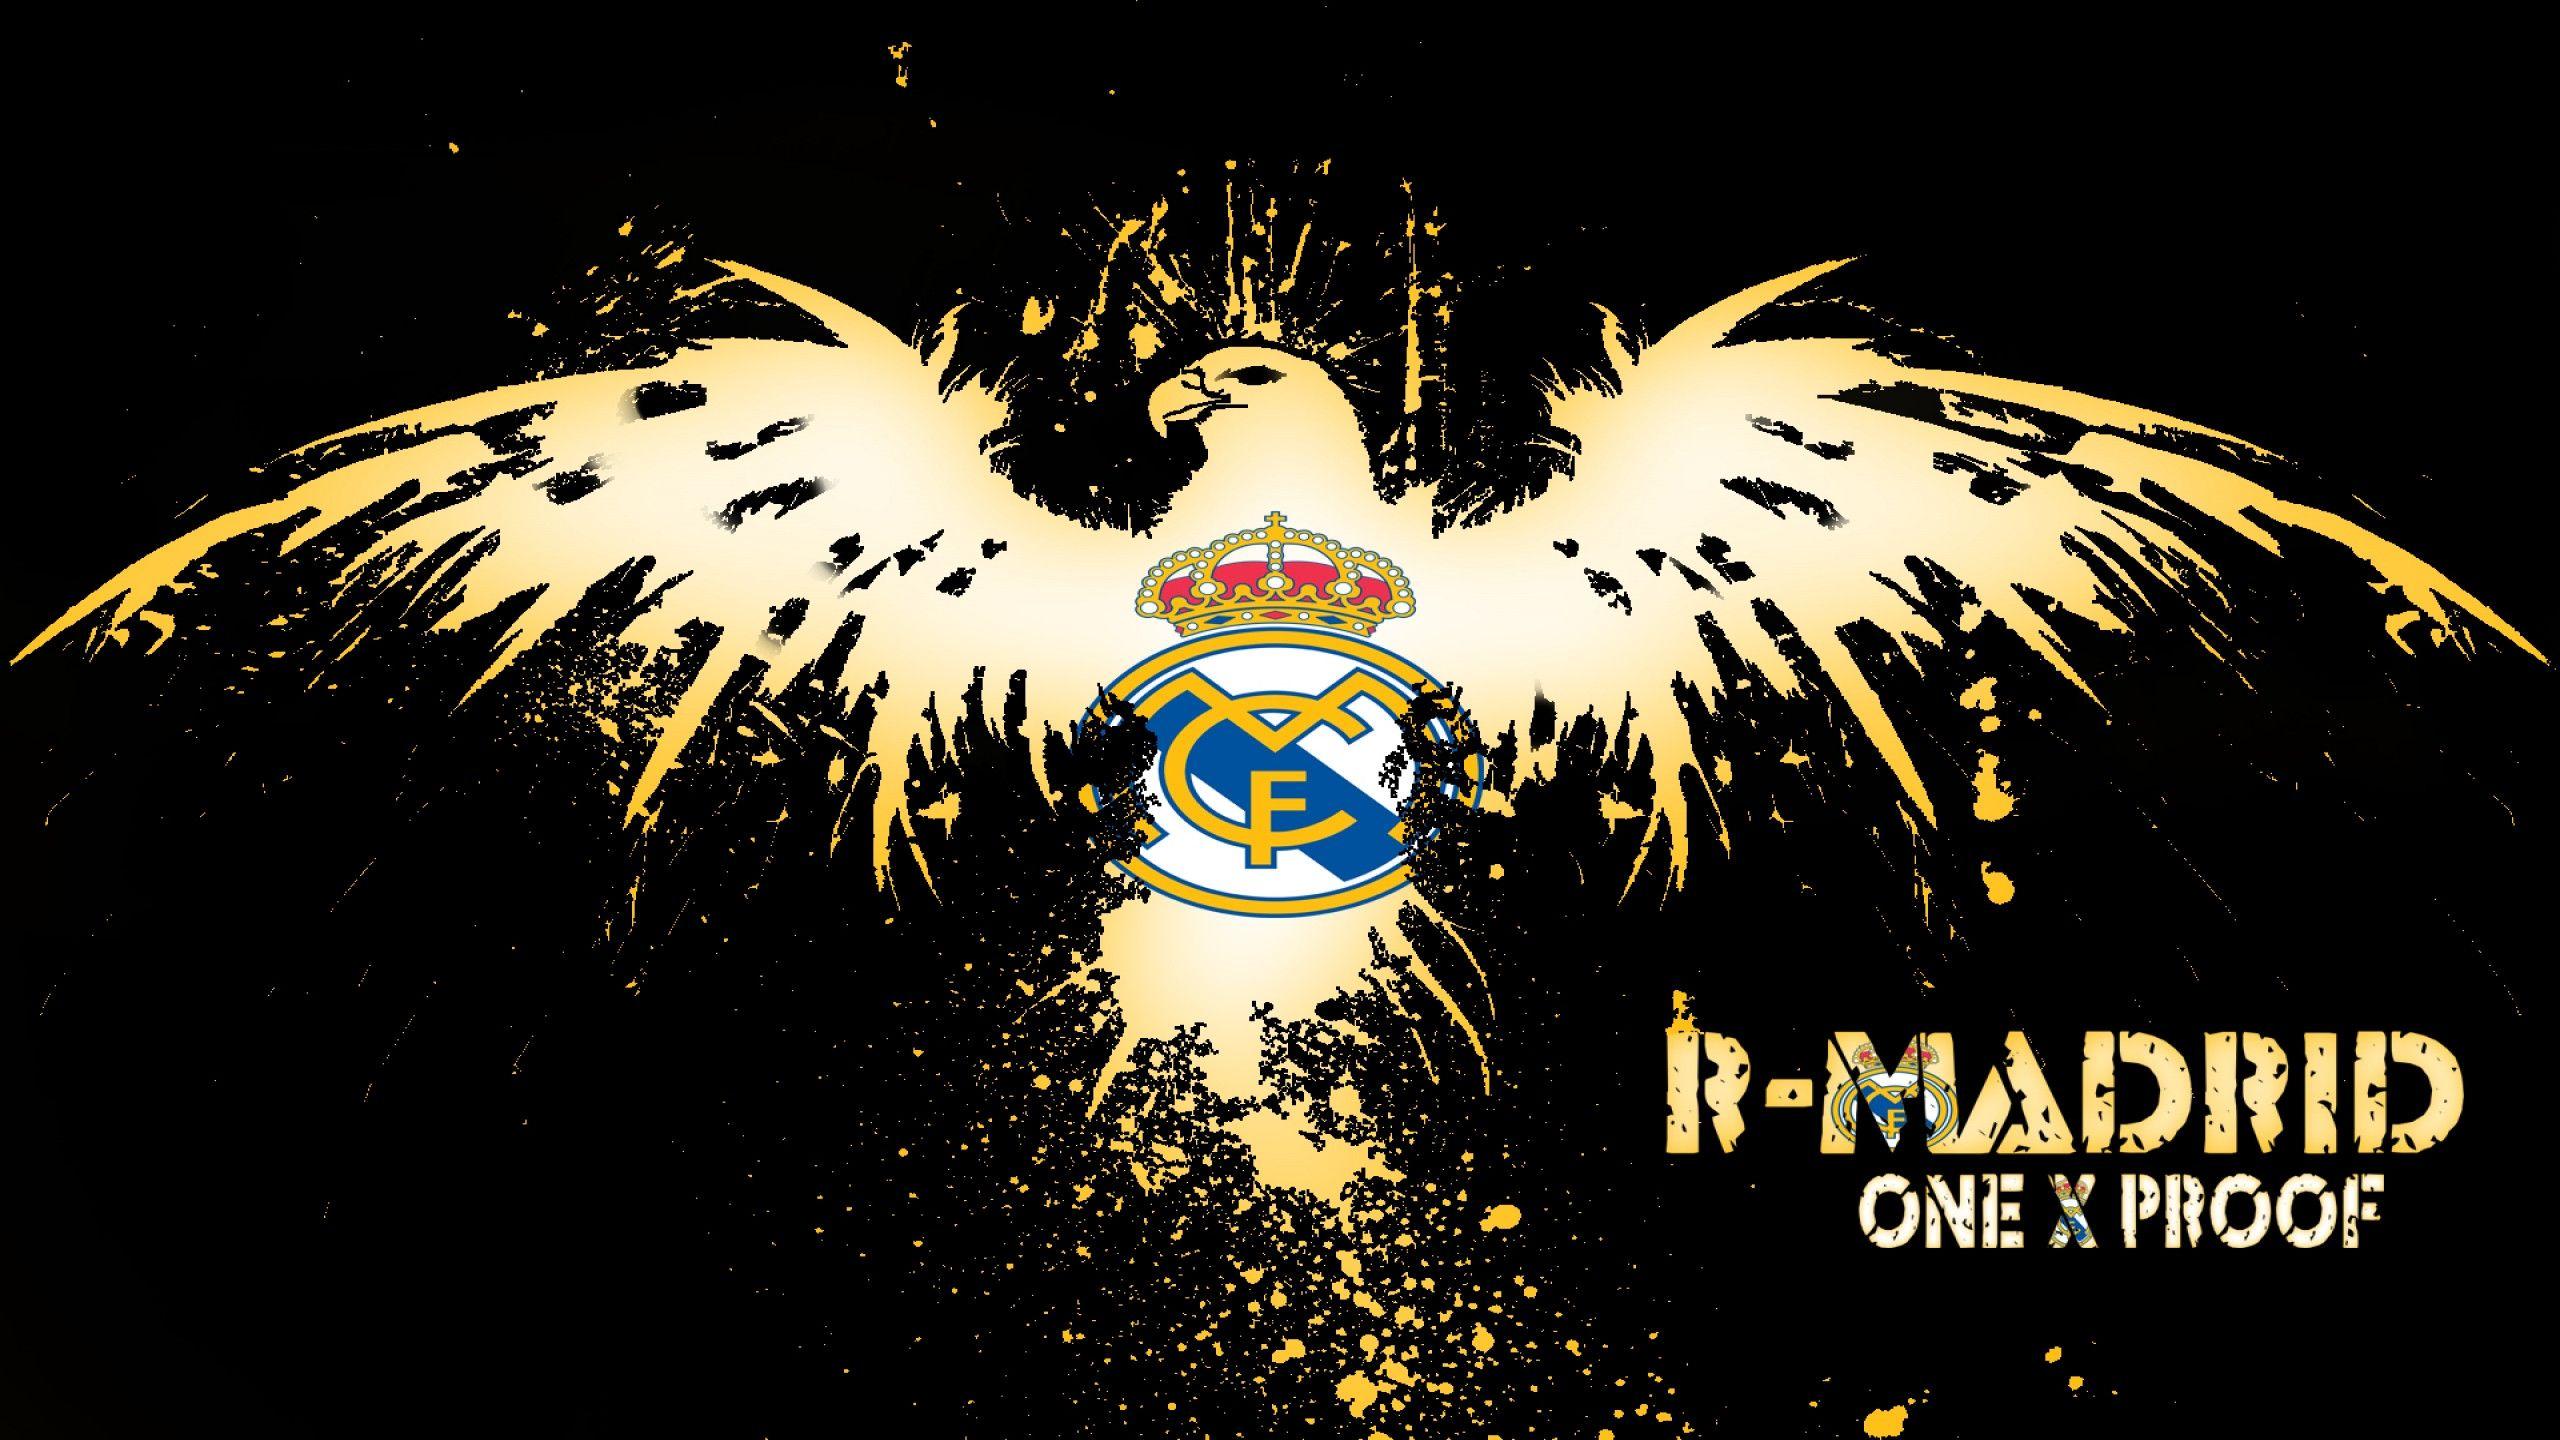 download Real Madrid Cf Logo HD Wallpaper 5389 Wallpaper 2560x1440